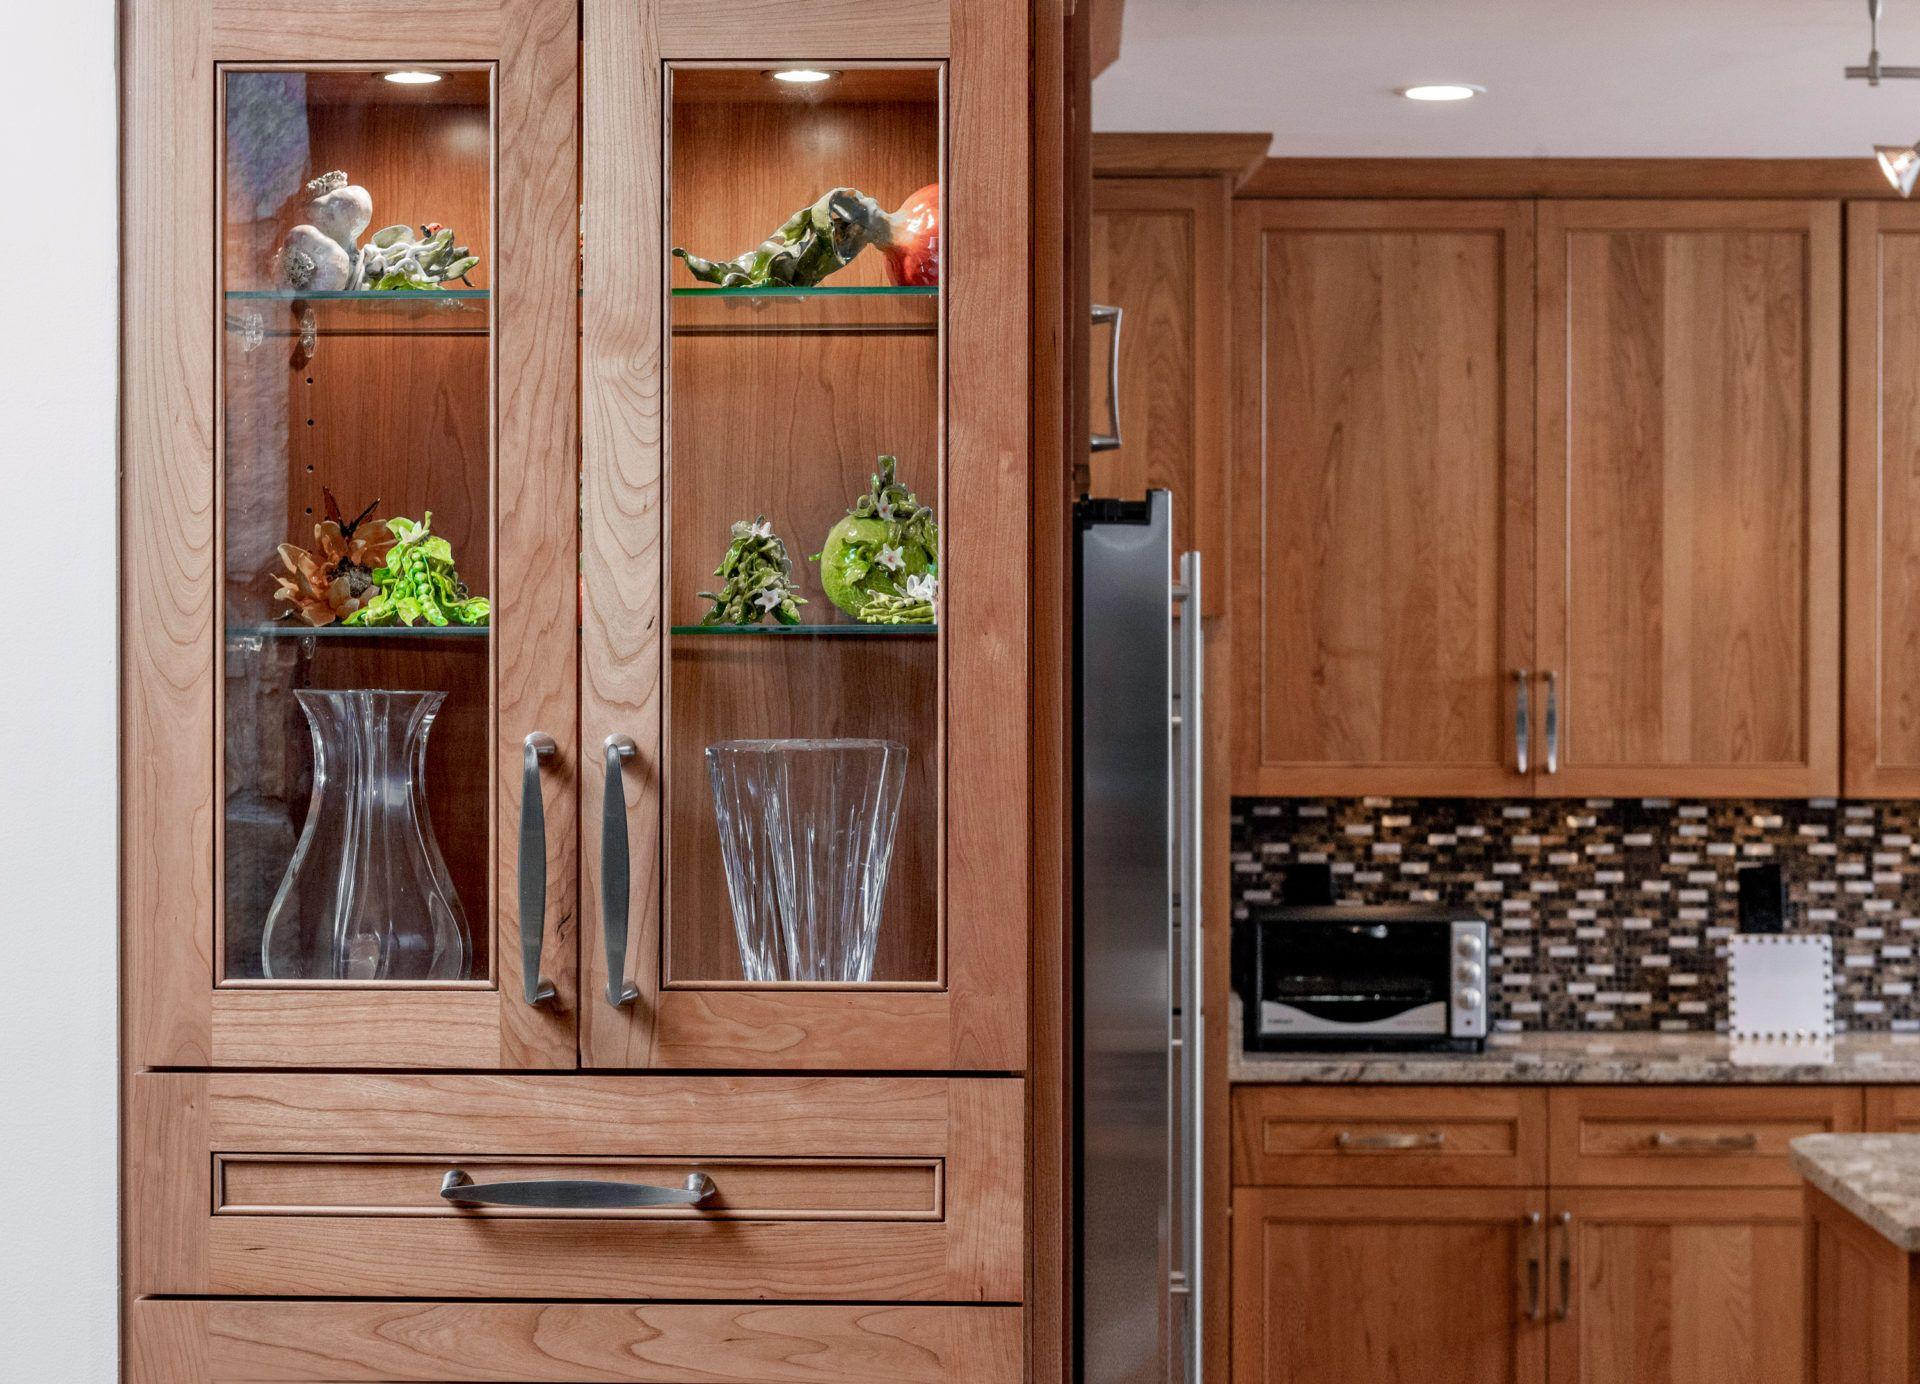 Great Falls Va K S Renewal Systems Llc In 2020 Kitchen Display Kitchen Cabinets Kitchen Refinishing